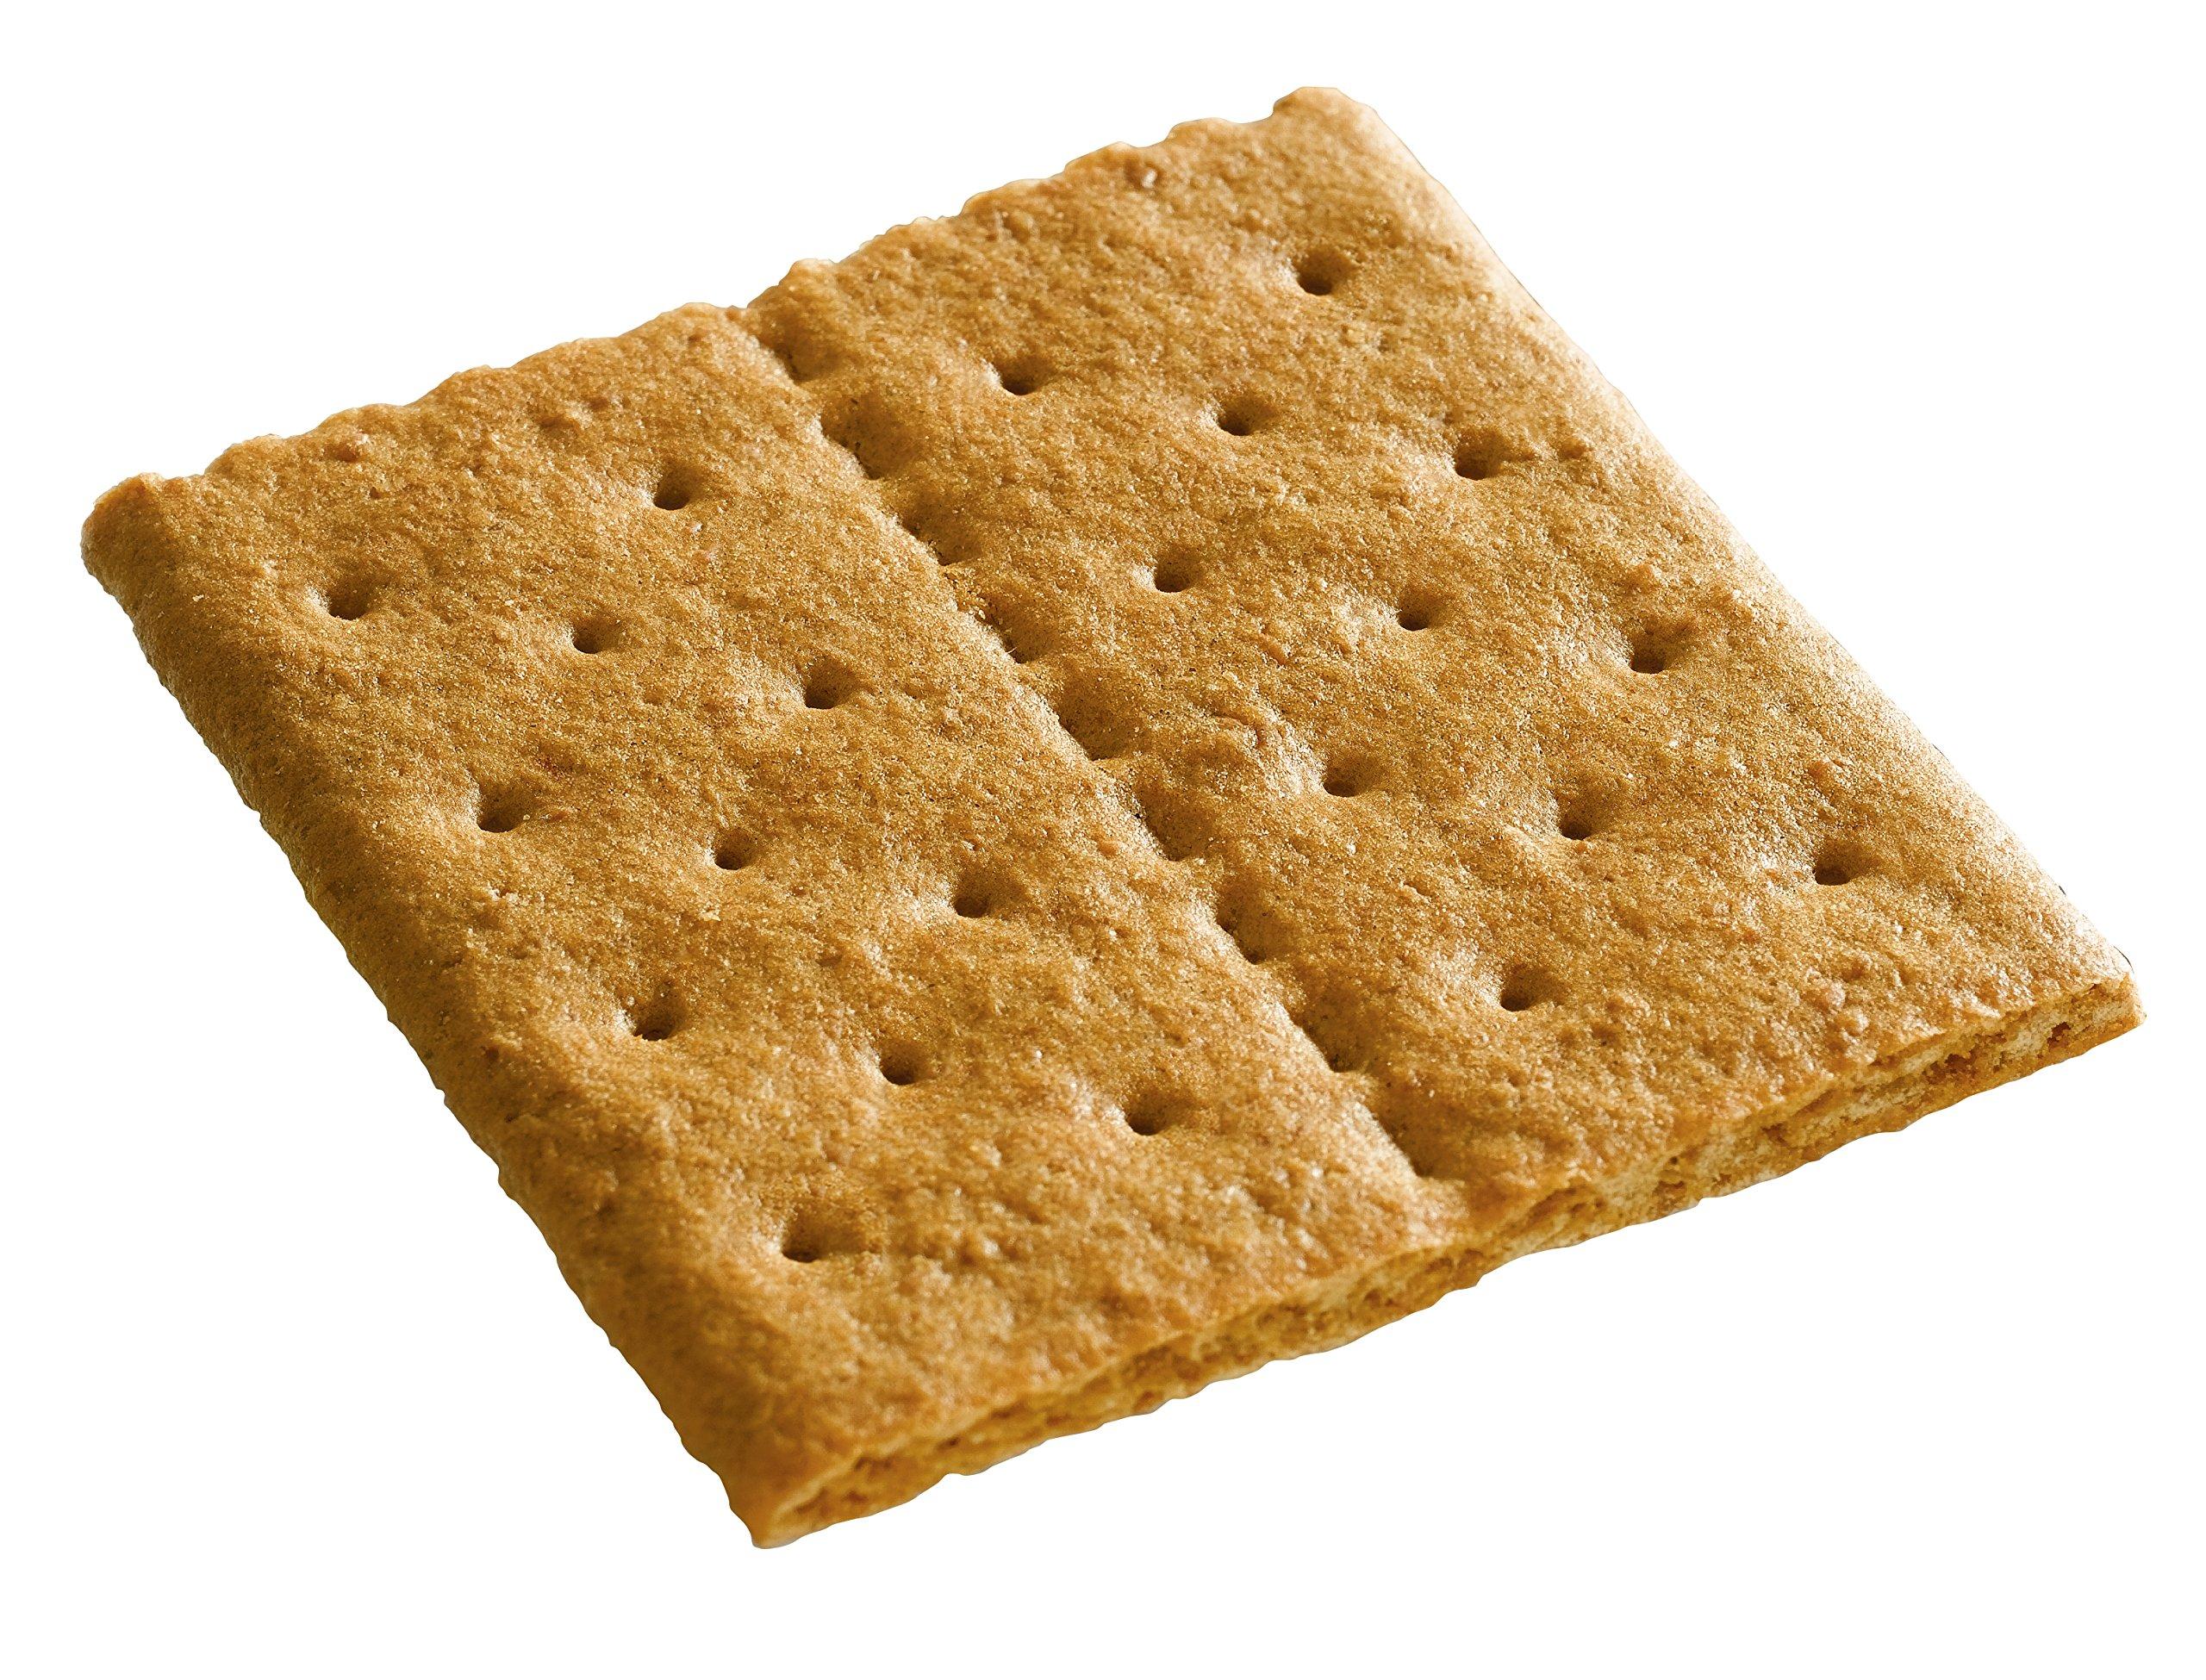 Honey Maid Honey Graham Crackers - Family Size, 25.6 Ounce (Pack of 6) by Honey Maid (Image #6)